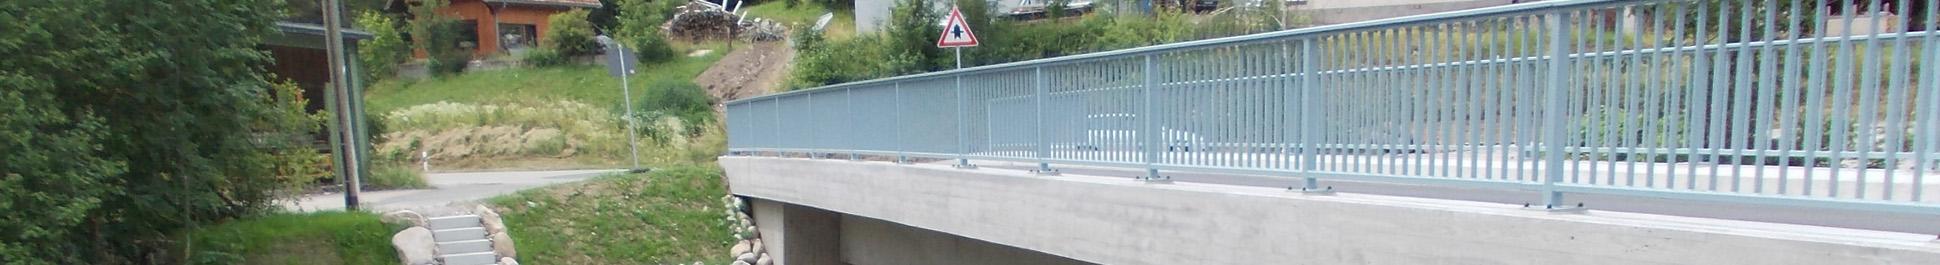 KonstruktionsgruppeBauenKonstanz-Straßenbrücken